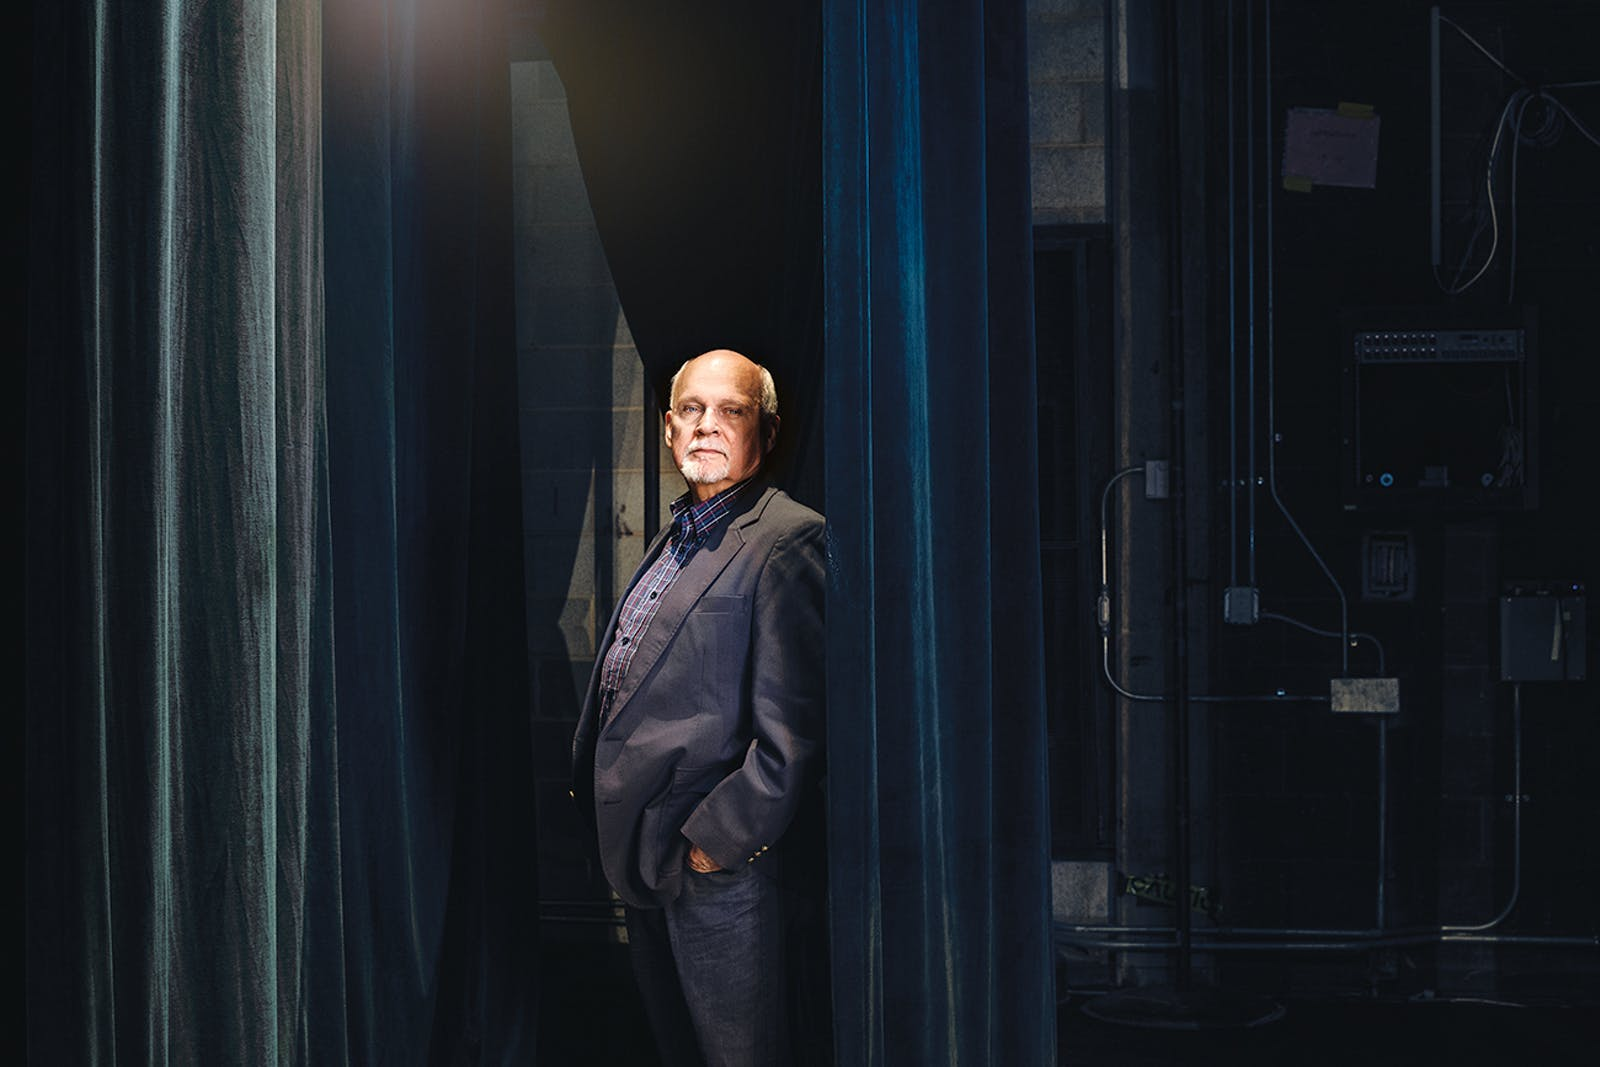 Raymond Caldwell in the Van Cliburn Auditorium, at Kilgore College, on August 27, 2019.